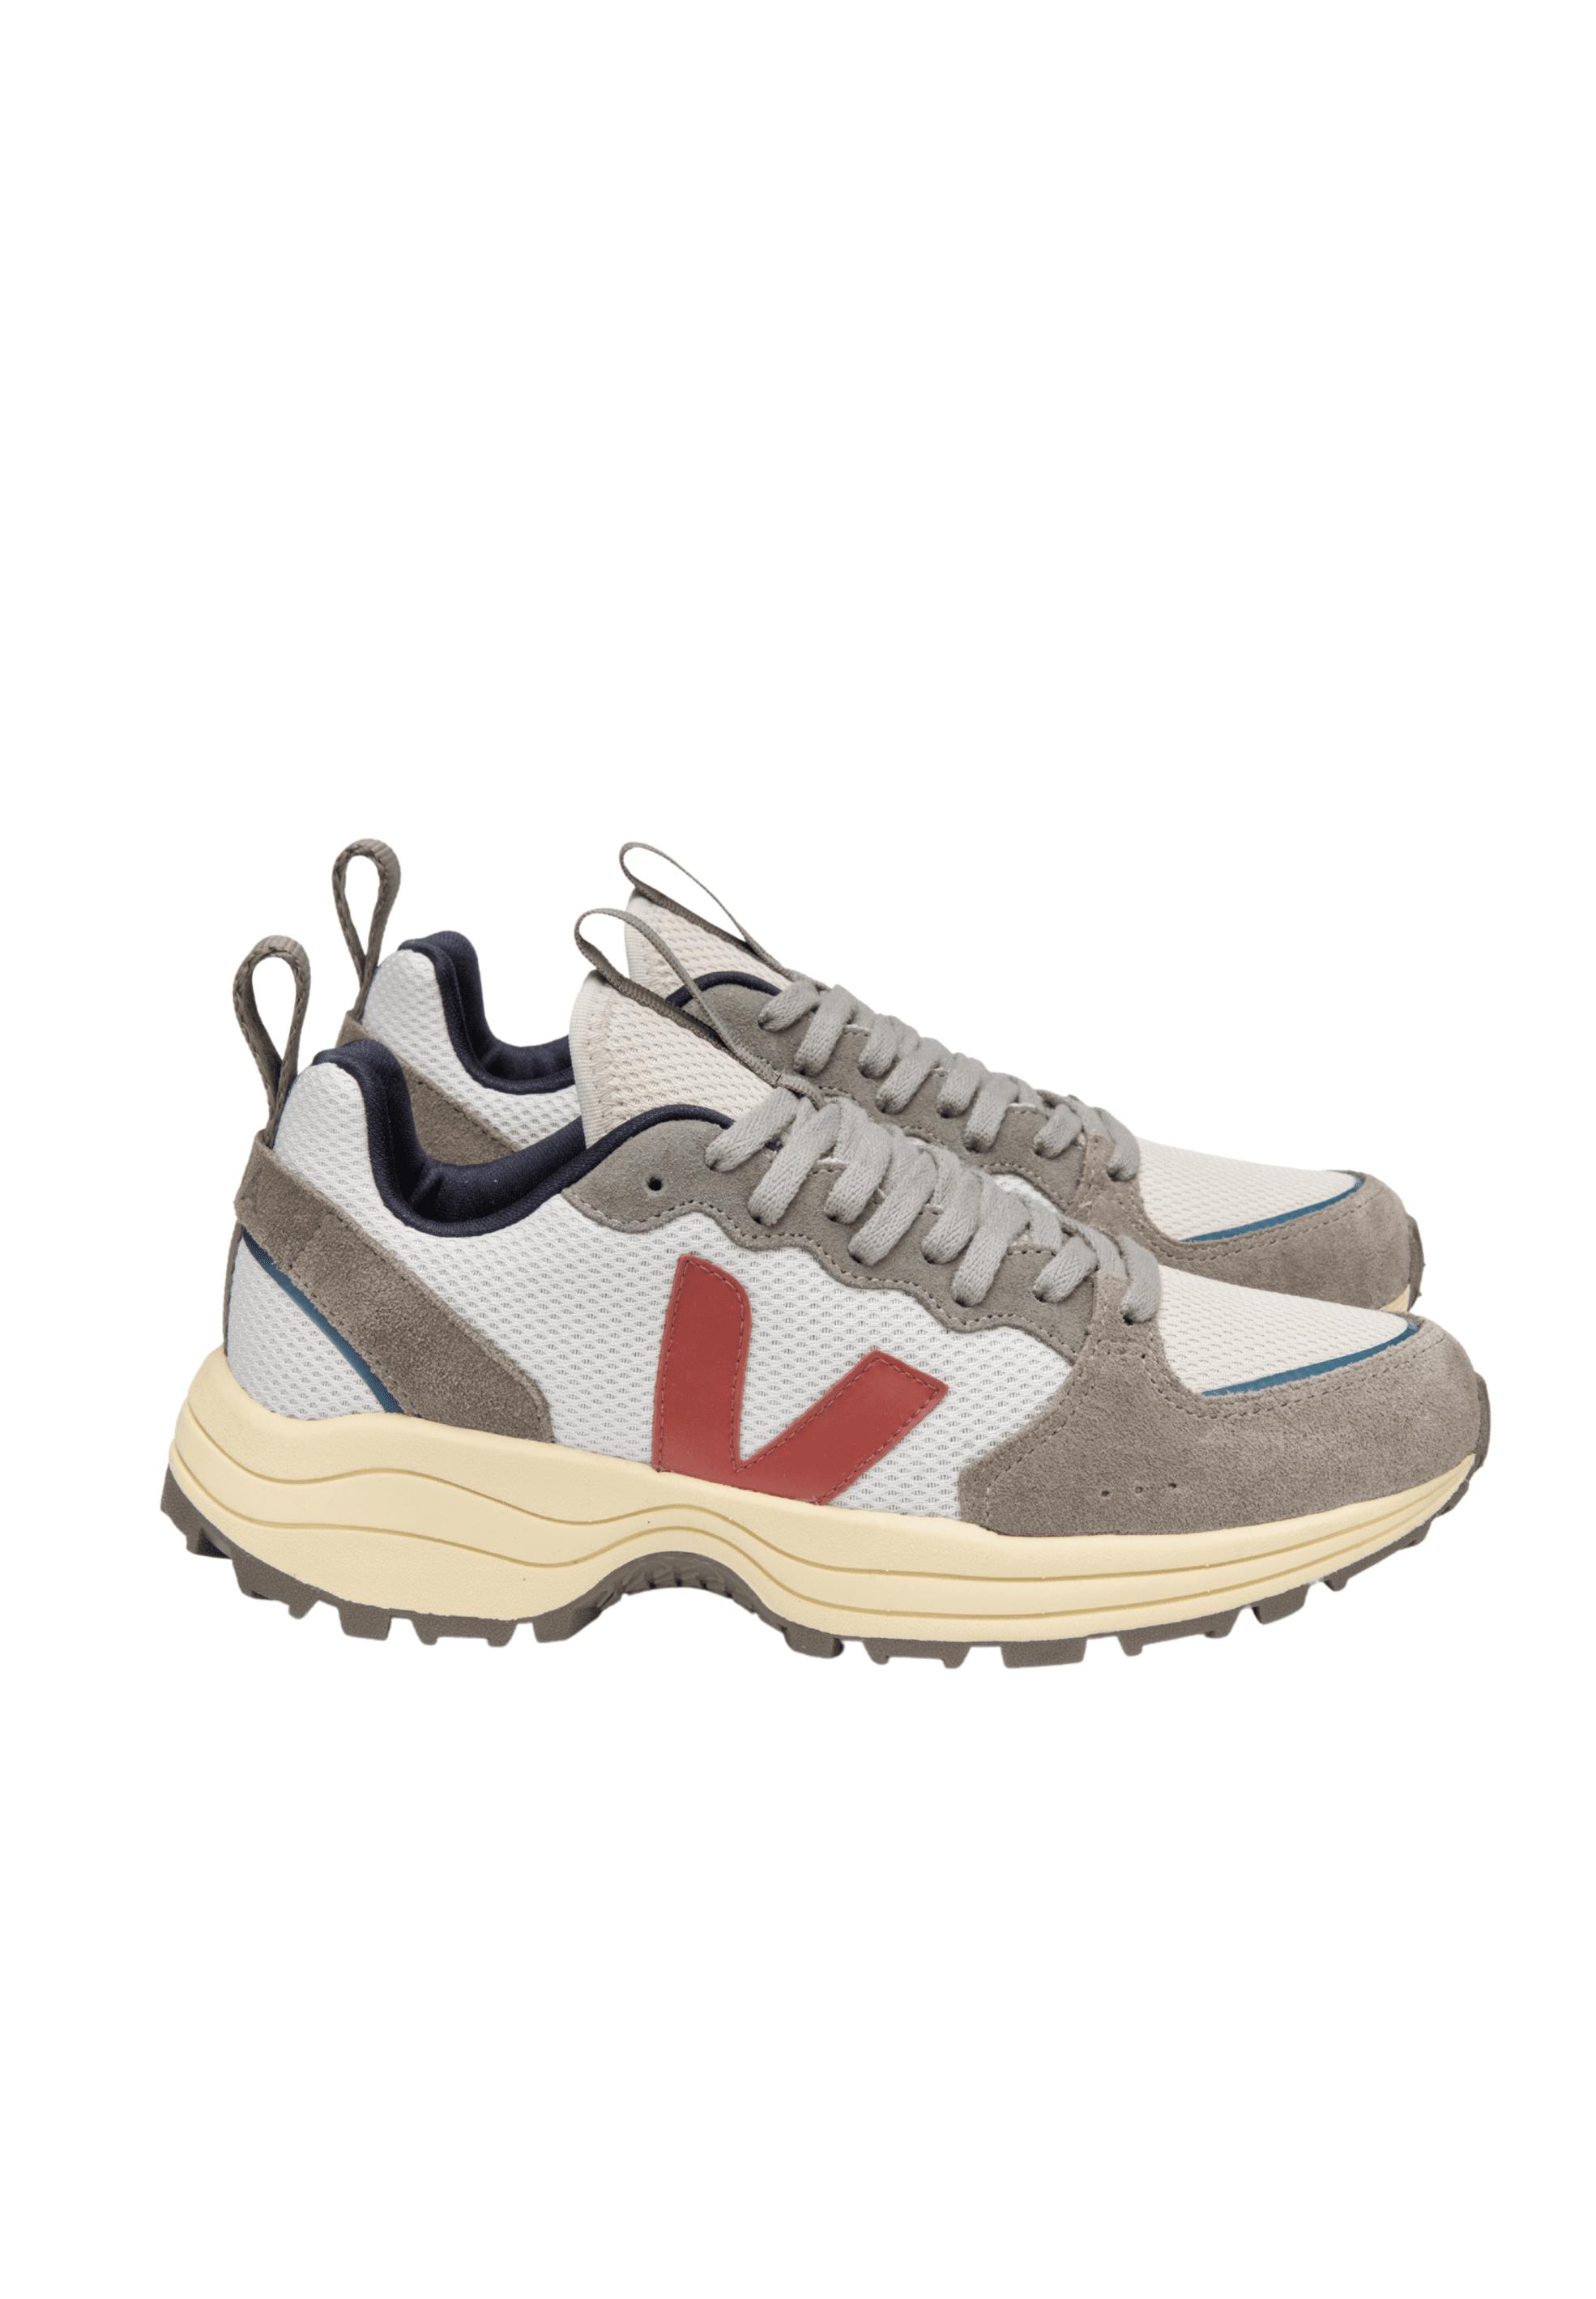 Venturi Alveomesh Multicolour Grey Rouille Sneakers